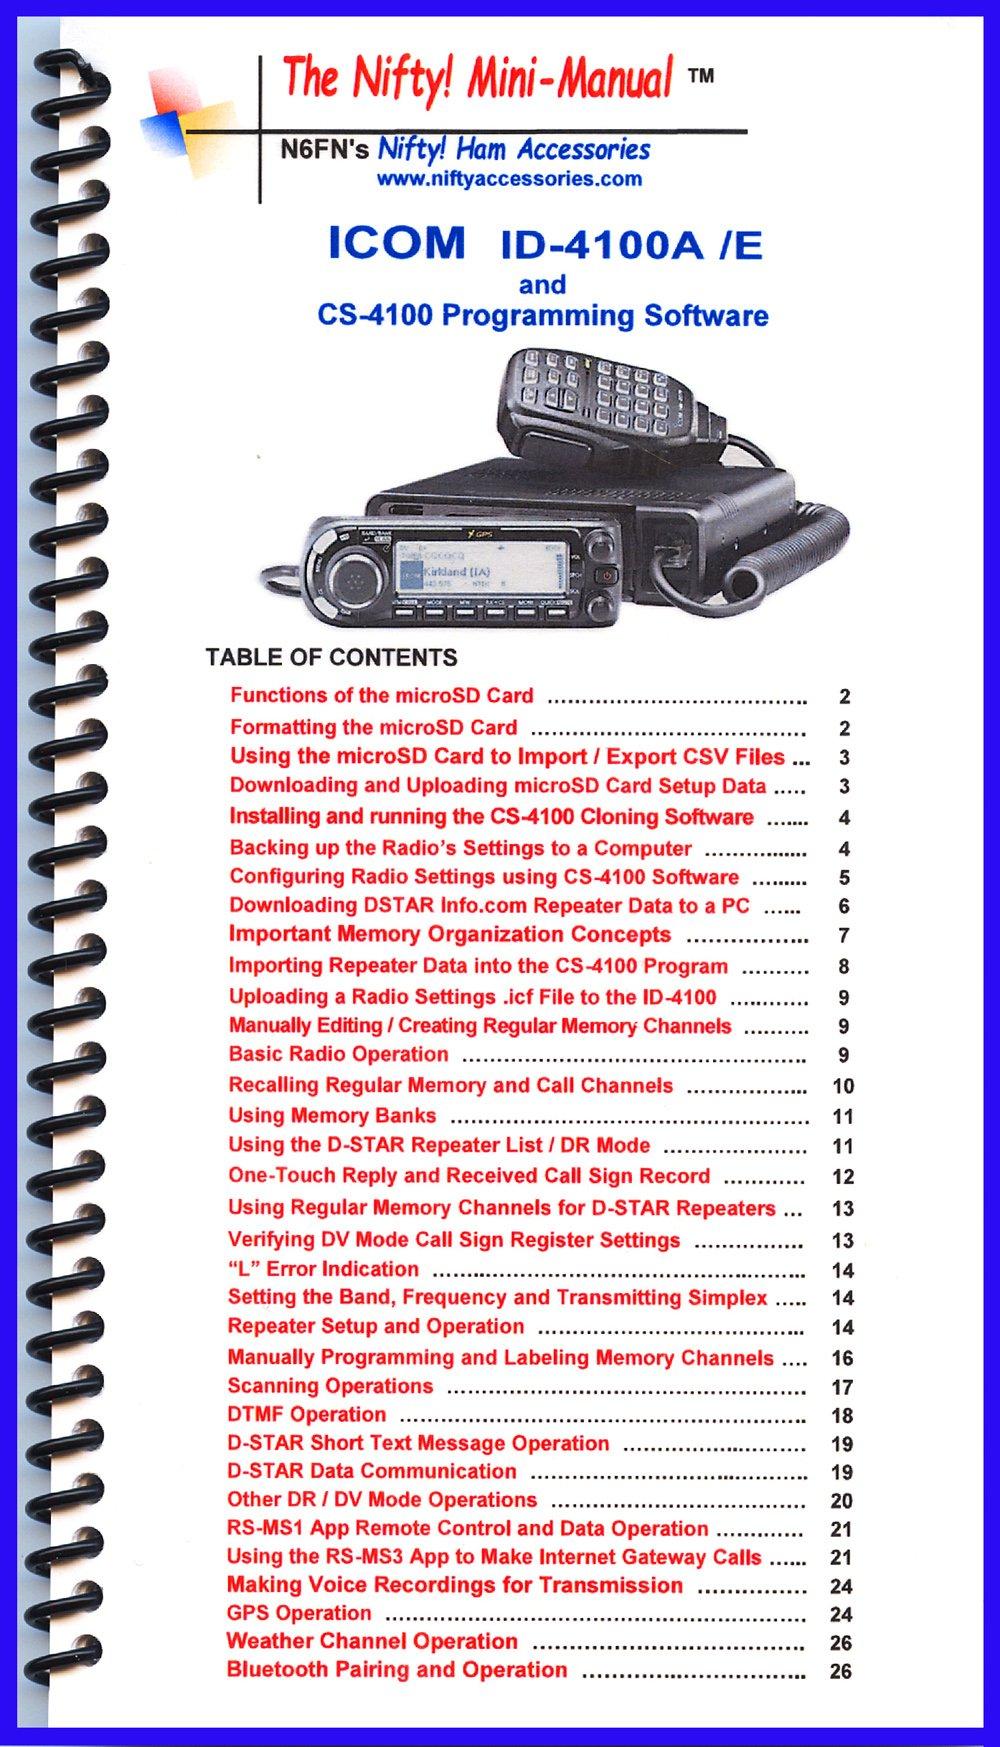 Icom ID-4100A /E Mini-Manual by Nifty Accessories pdf